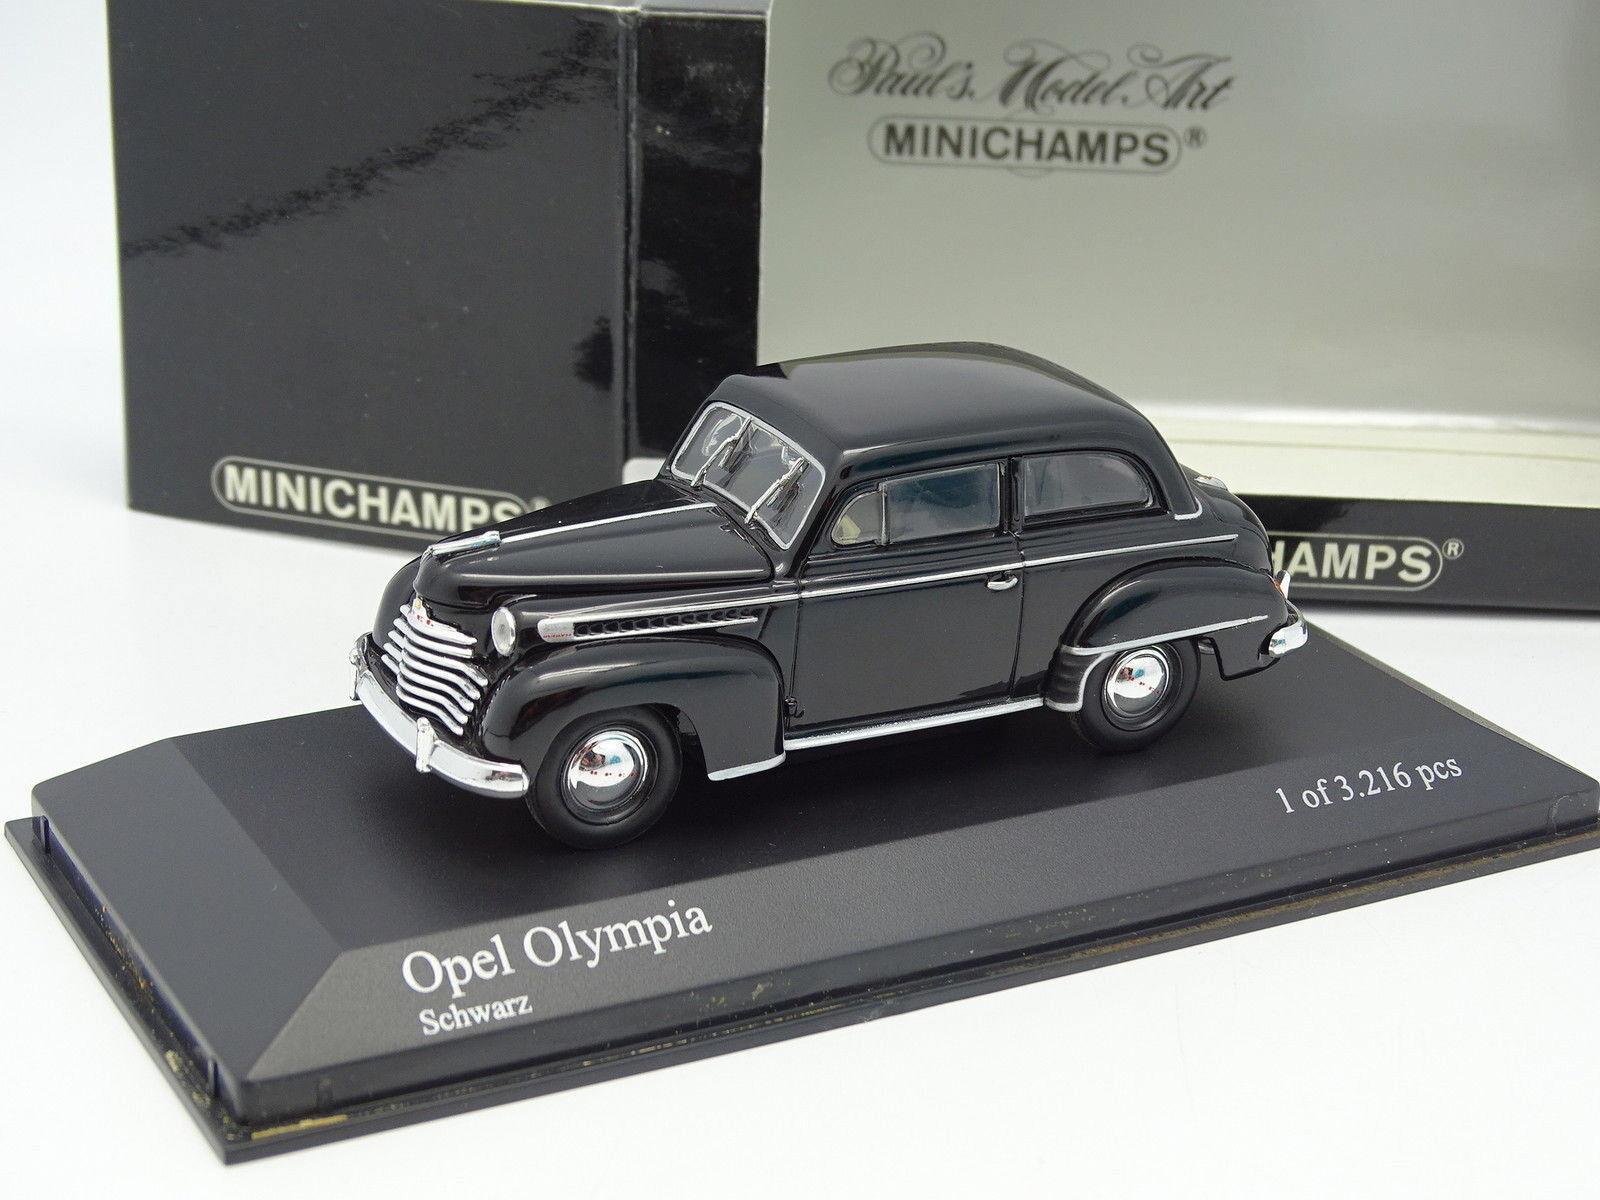 Minichamps 1 43 - Opel Olympia 1952 black black black bf2422